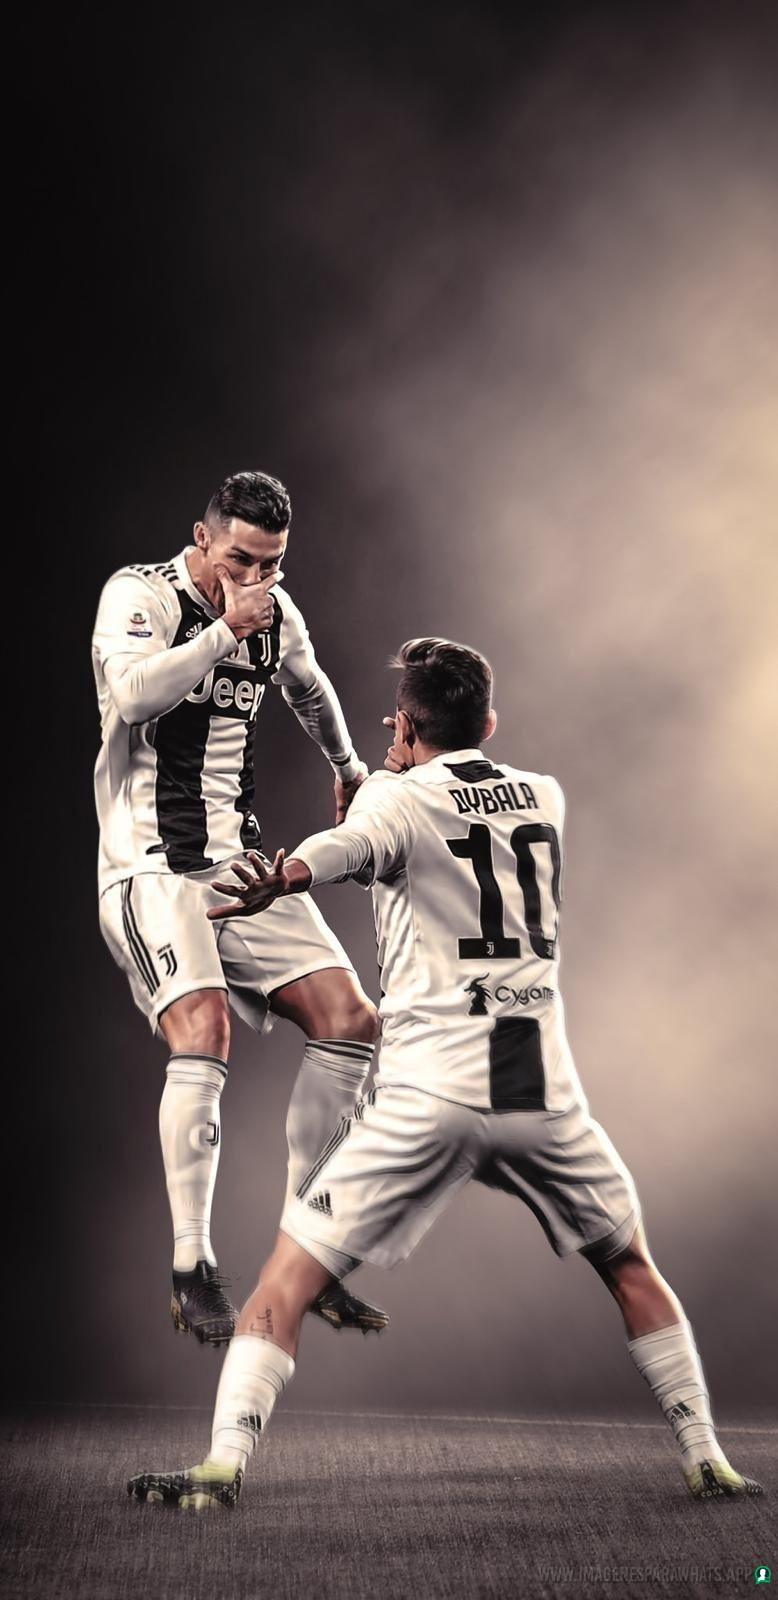 Imagenes de Futbol (1171)